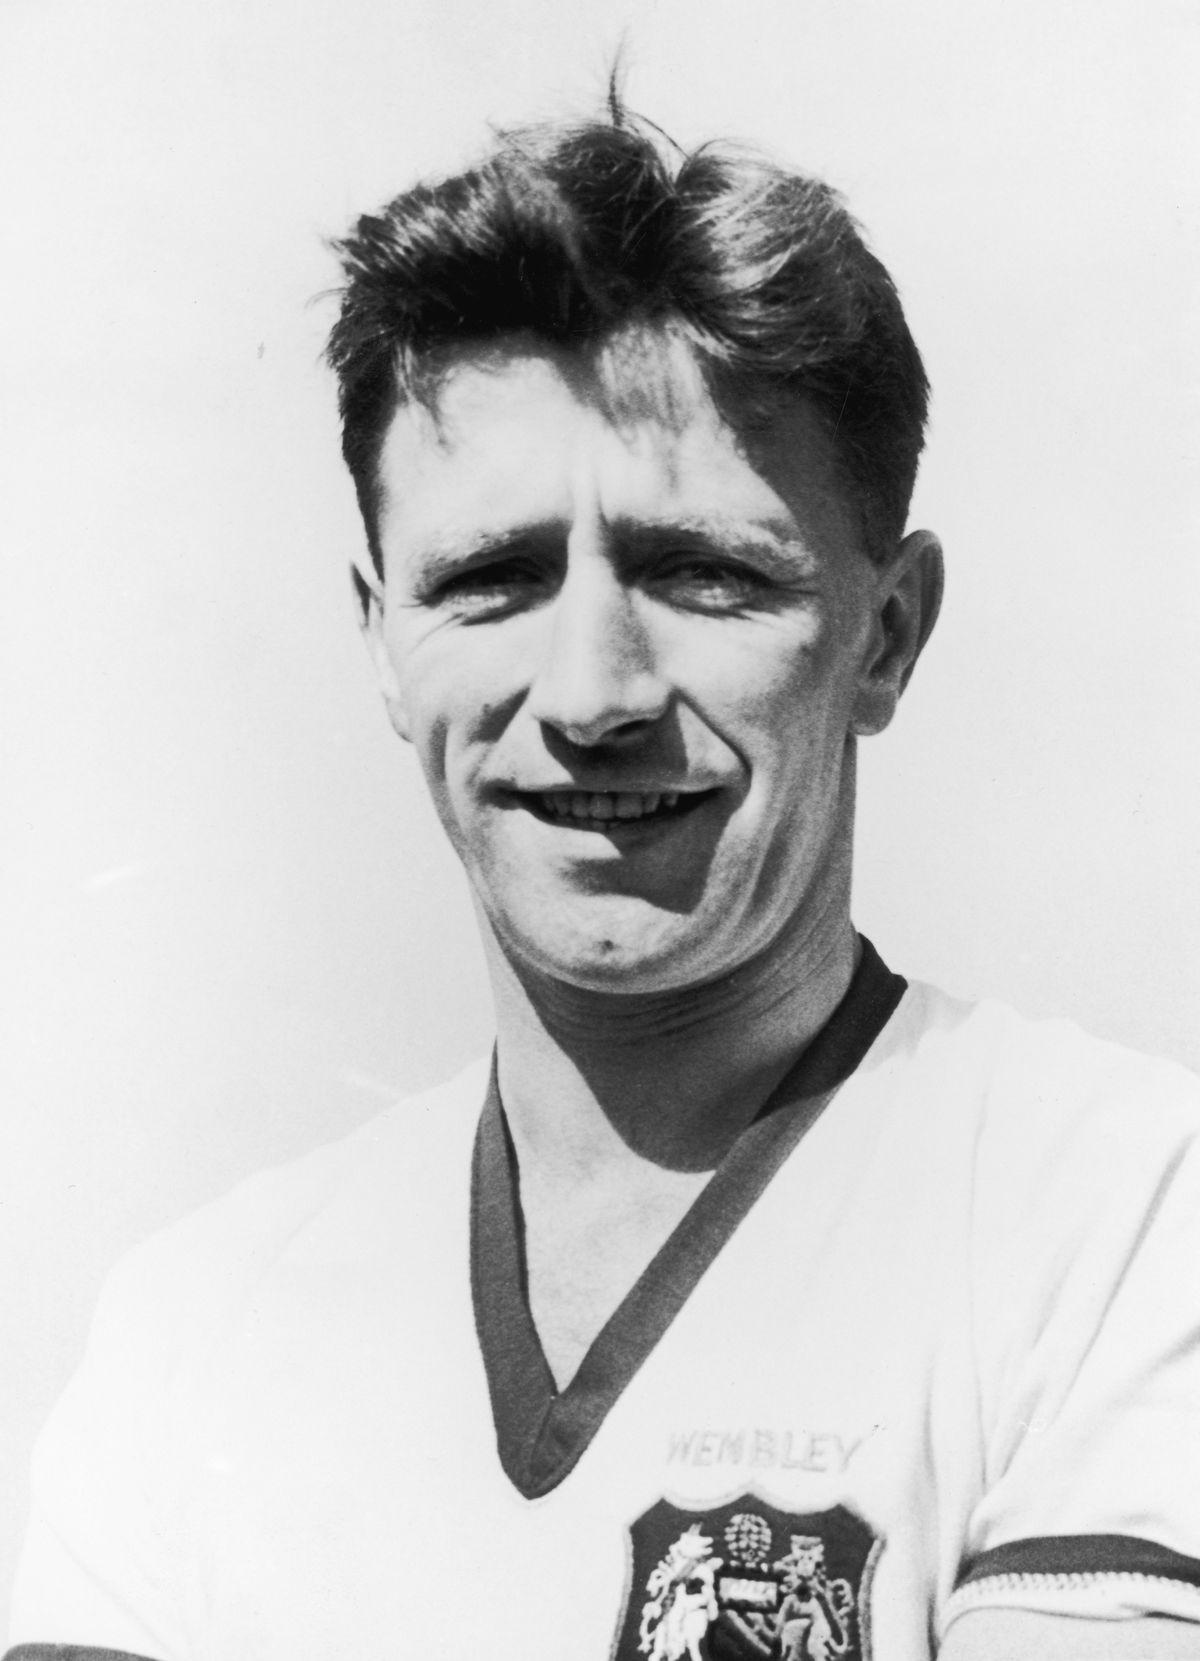 Roger Byrne